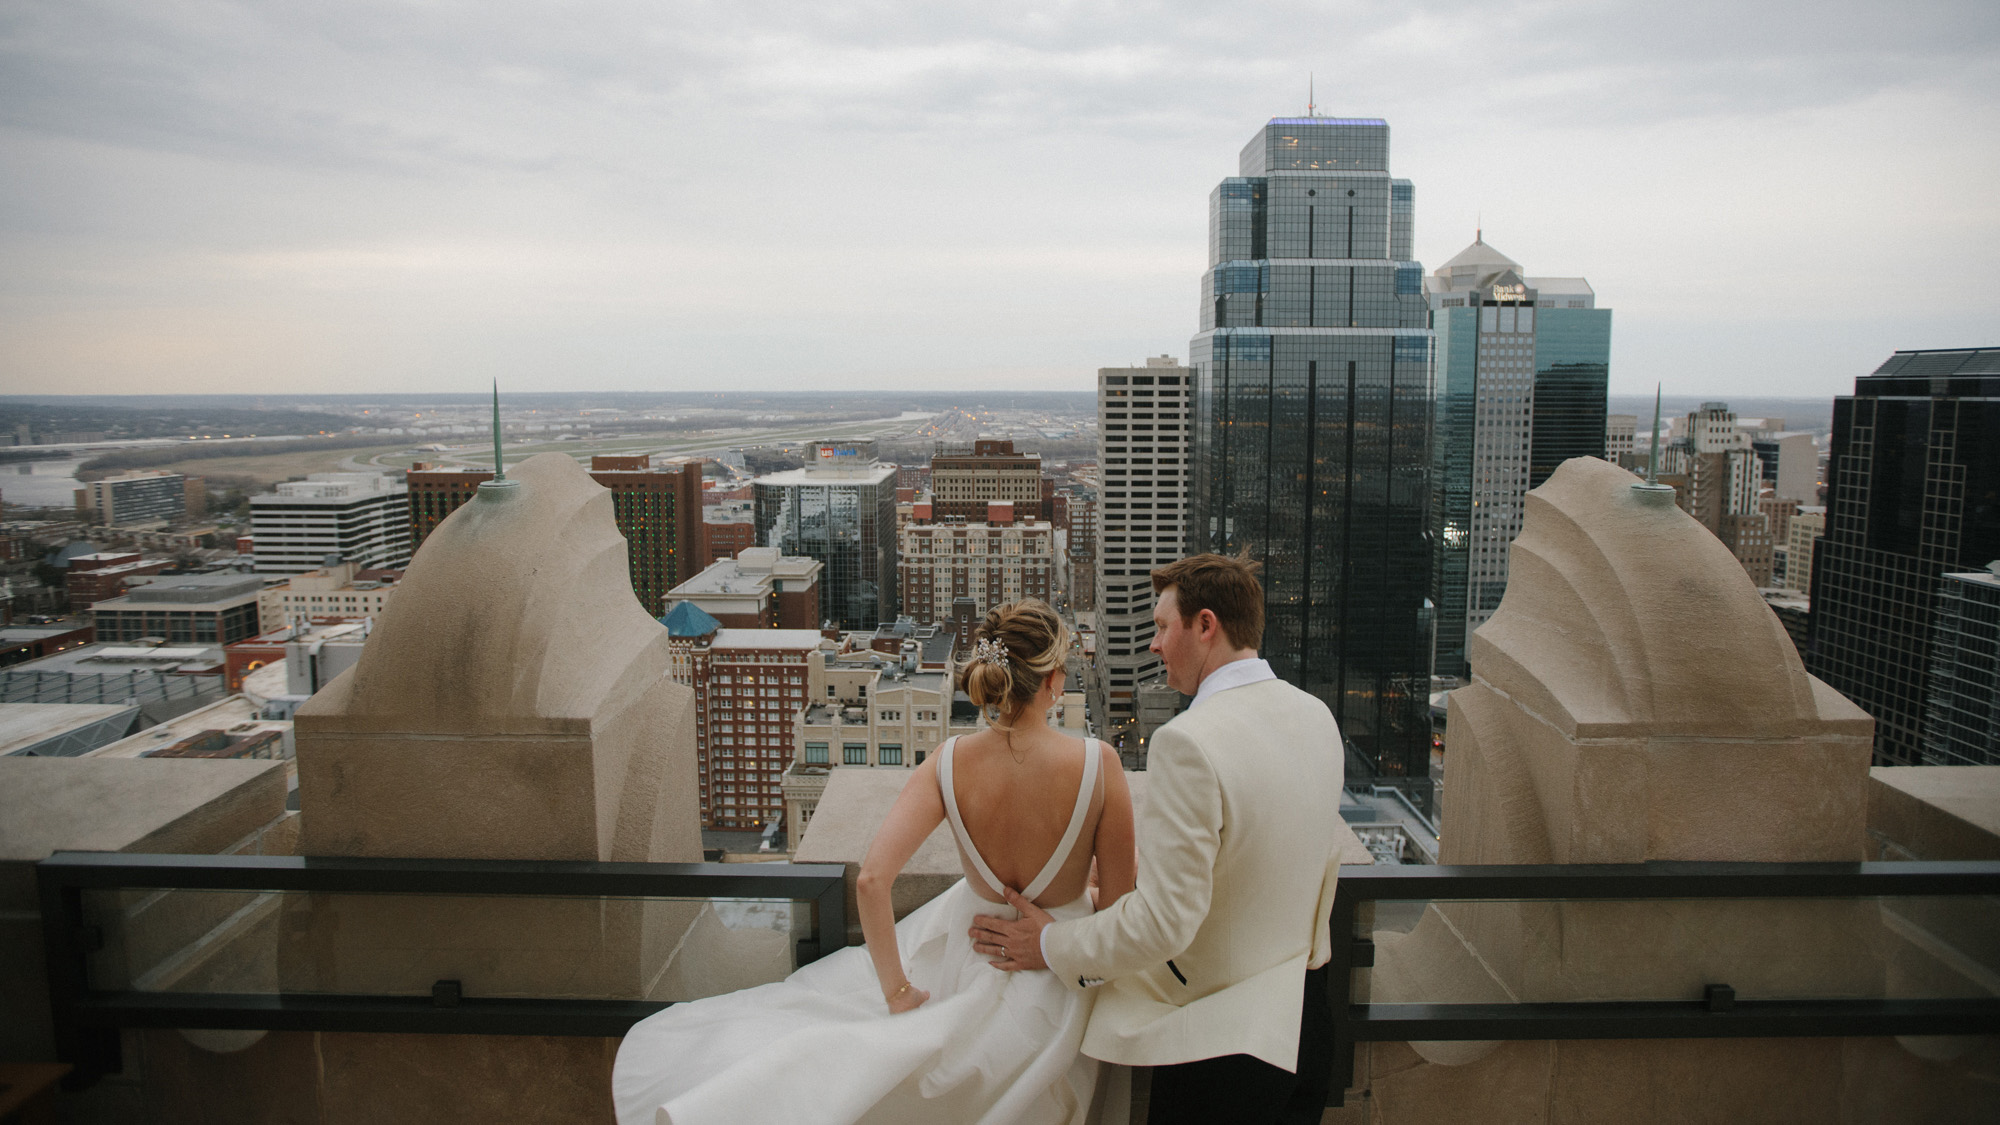 Alec_Vanderboom_kansas_city_hip_wedding_photos-0071.jpg